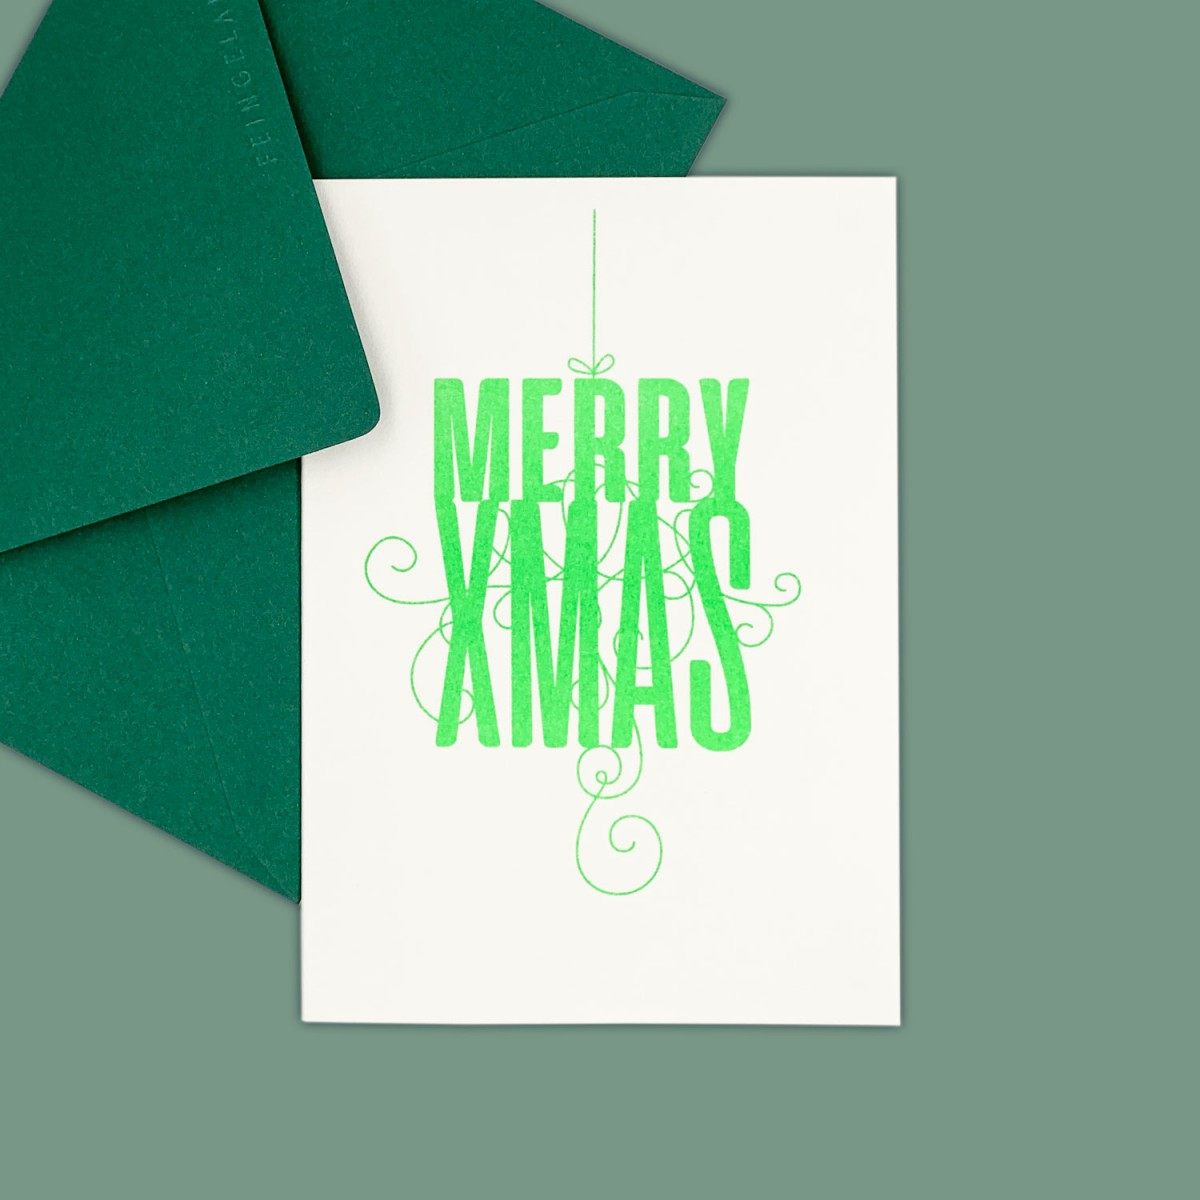 Feingeladen // FANCY TYPE // Merry Xmas (FG) – A6